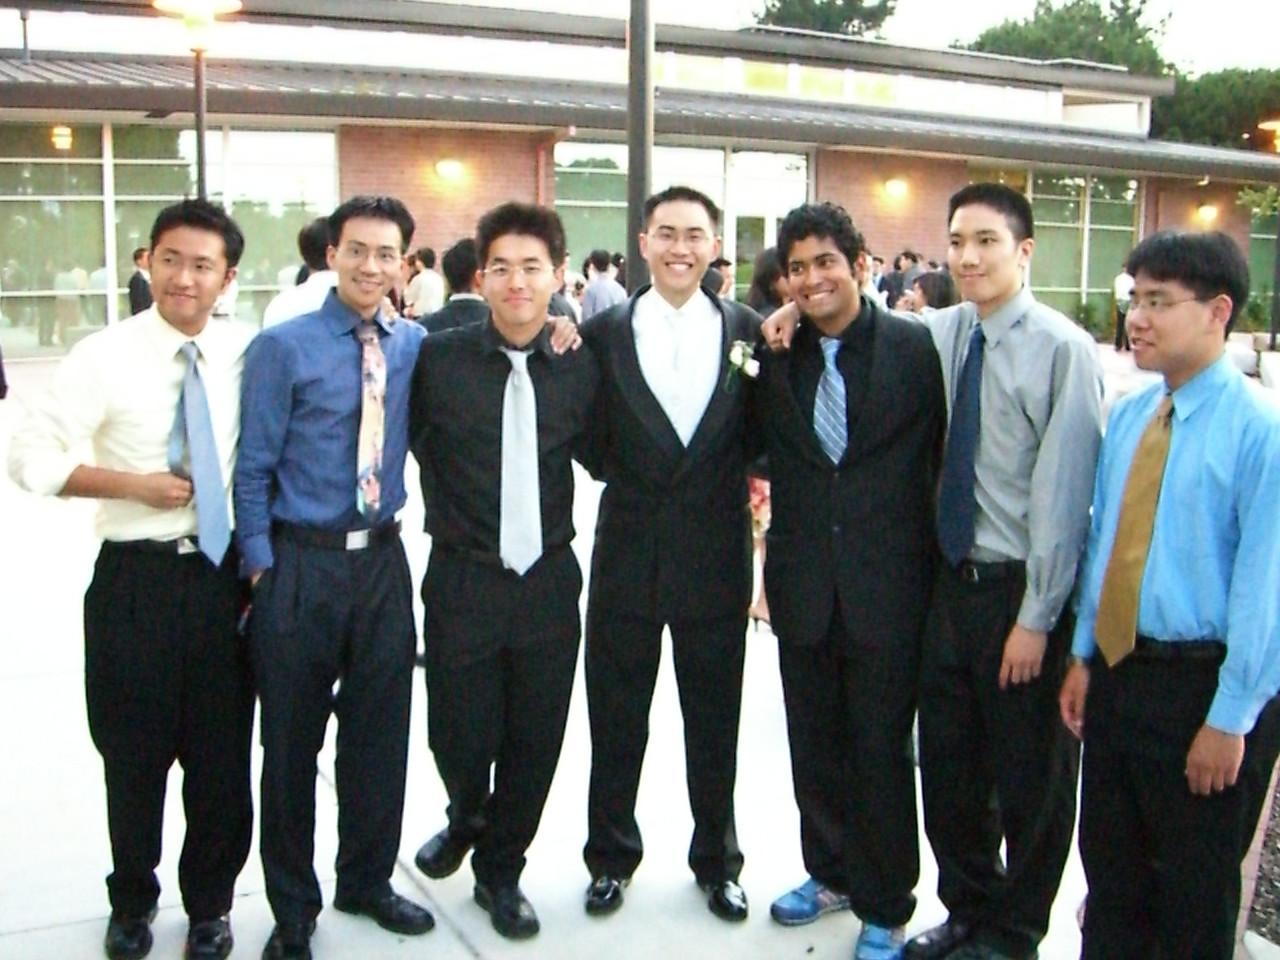 2006 06 24 Sat - TMony guys Bryan Lung, Ben Yu, Hyungsoo Kim, Ben Poon, Pablo Pozo, Michael Lin, & David Chiang 2